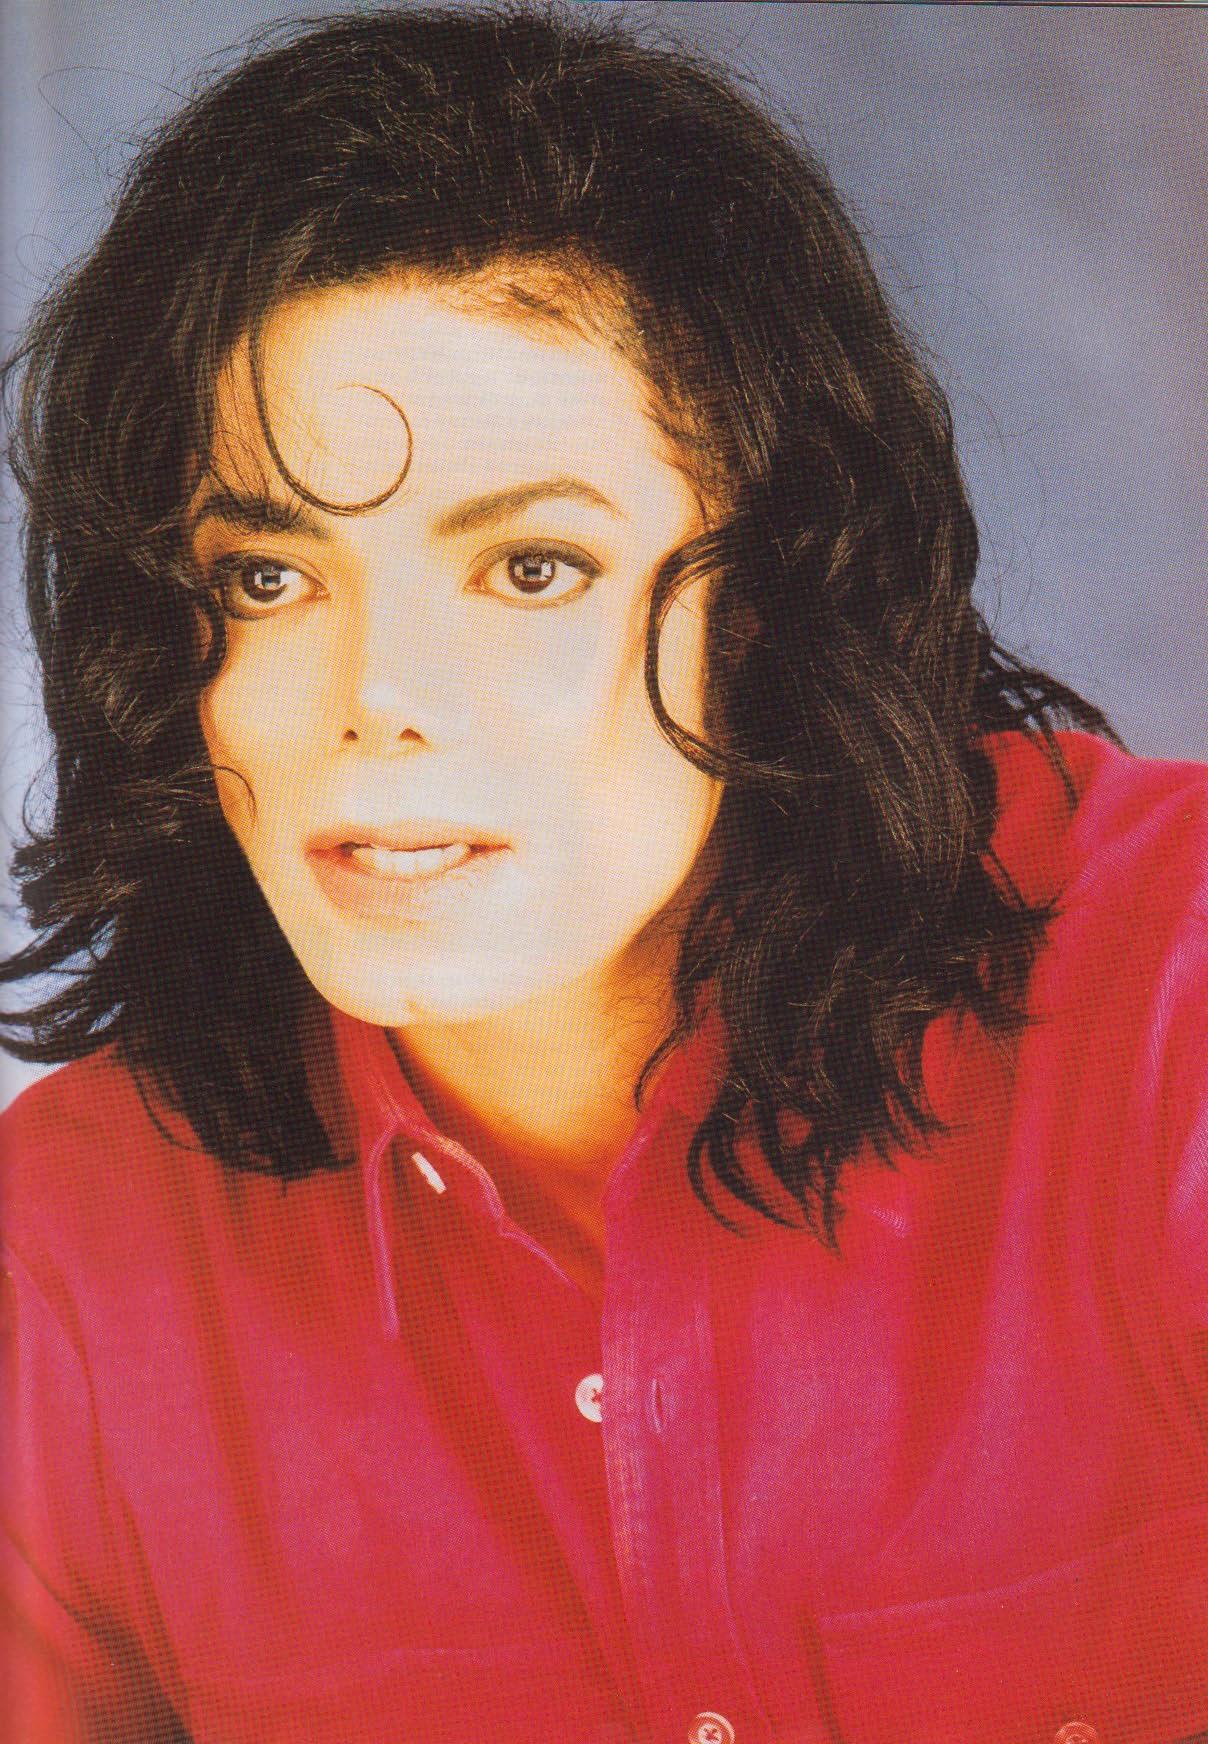 Michael Jackson - HQ Scan - Pink shirt